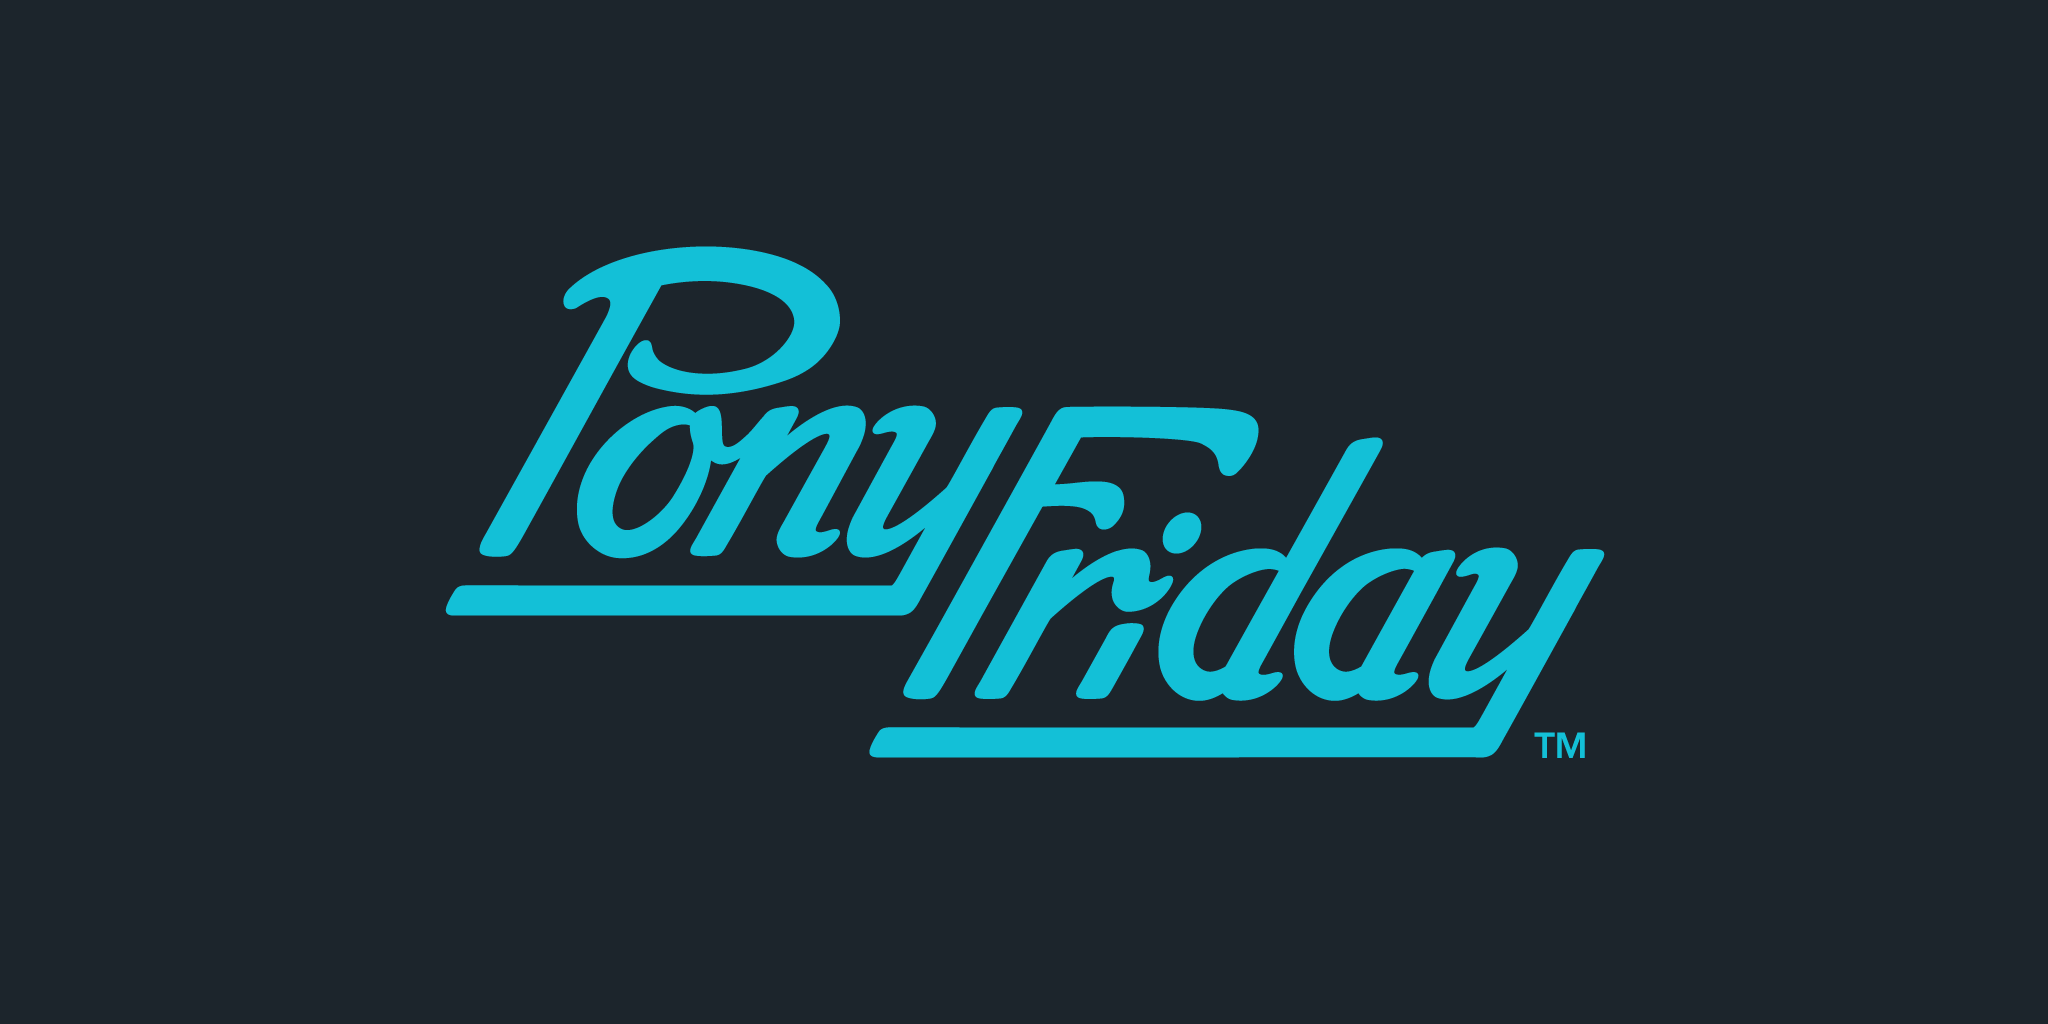 Pony-Friday-Blue-Black-Logo-Typography-Brand-Trademark-Studio-Blog-Header-Image.png